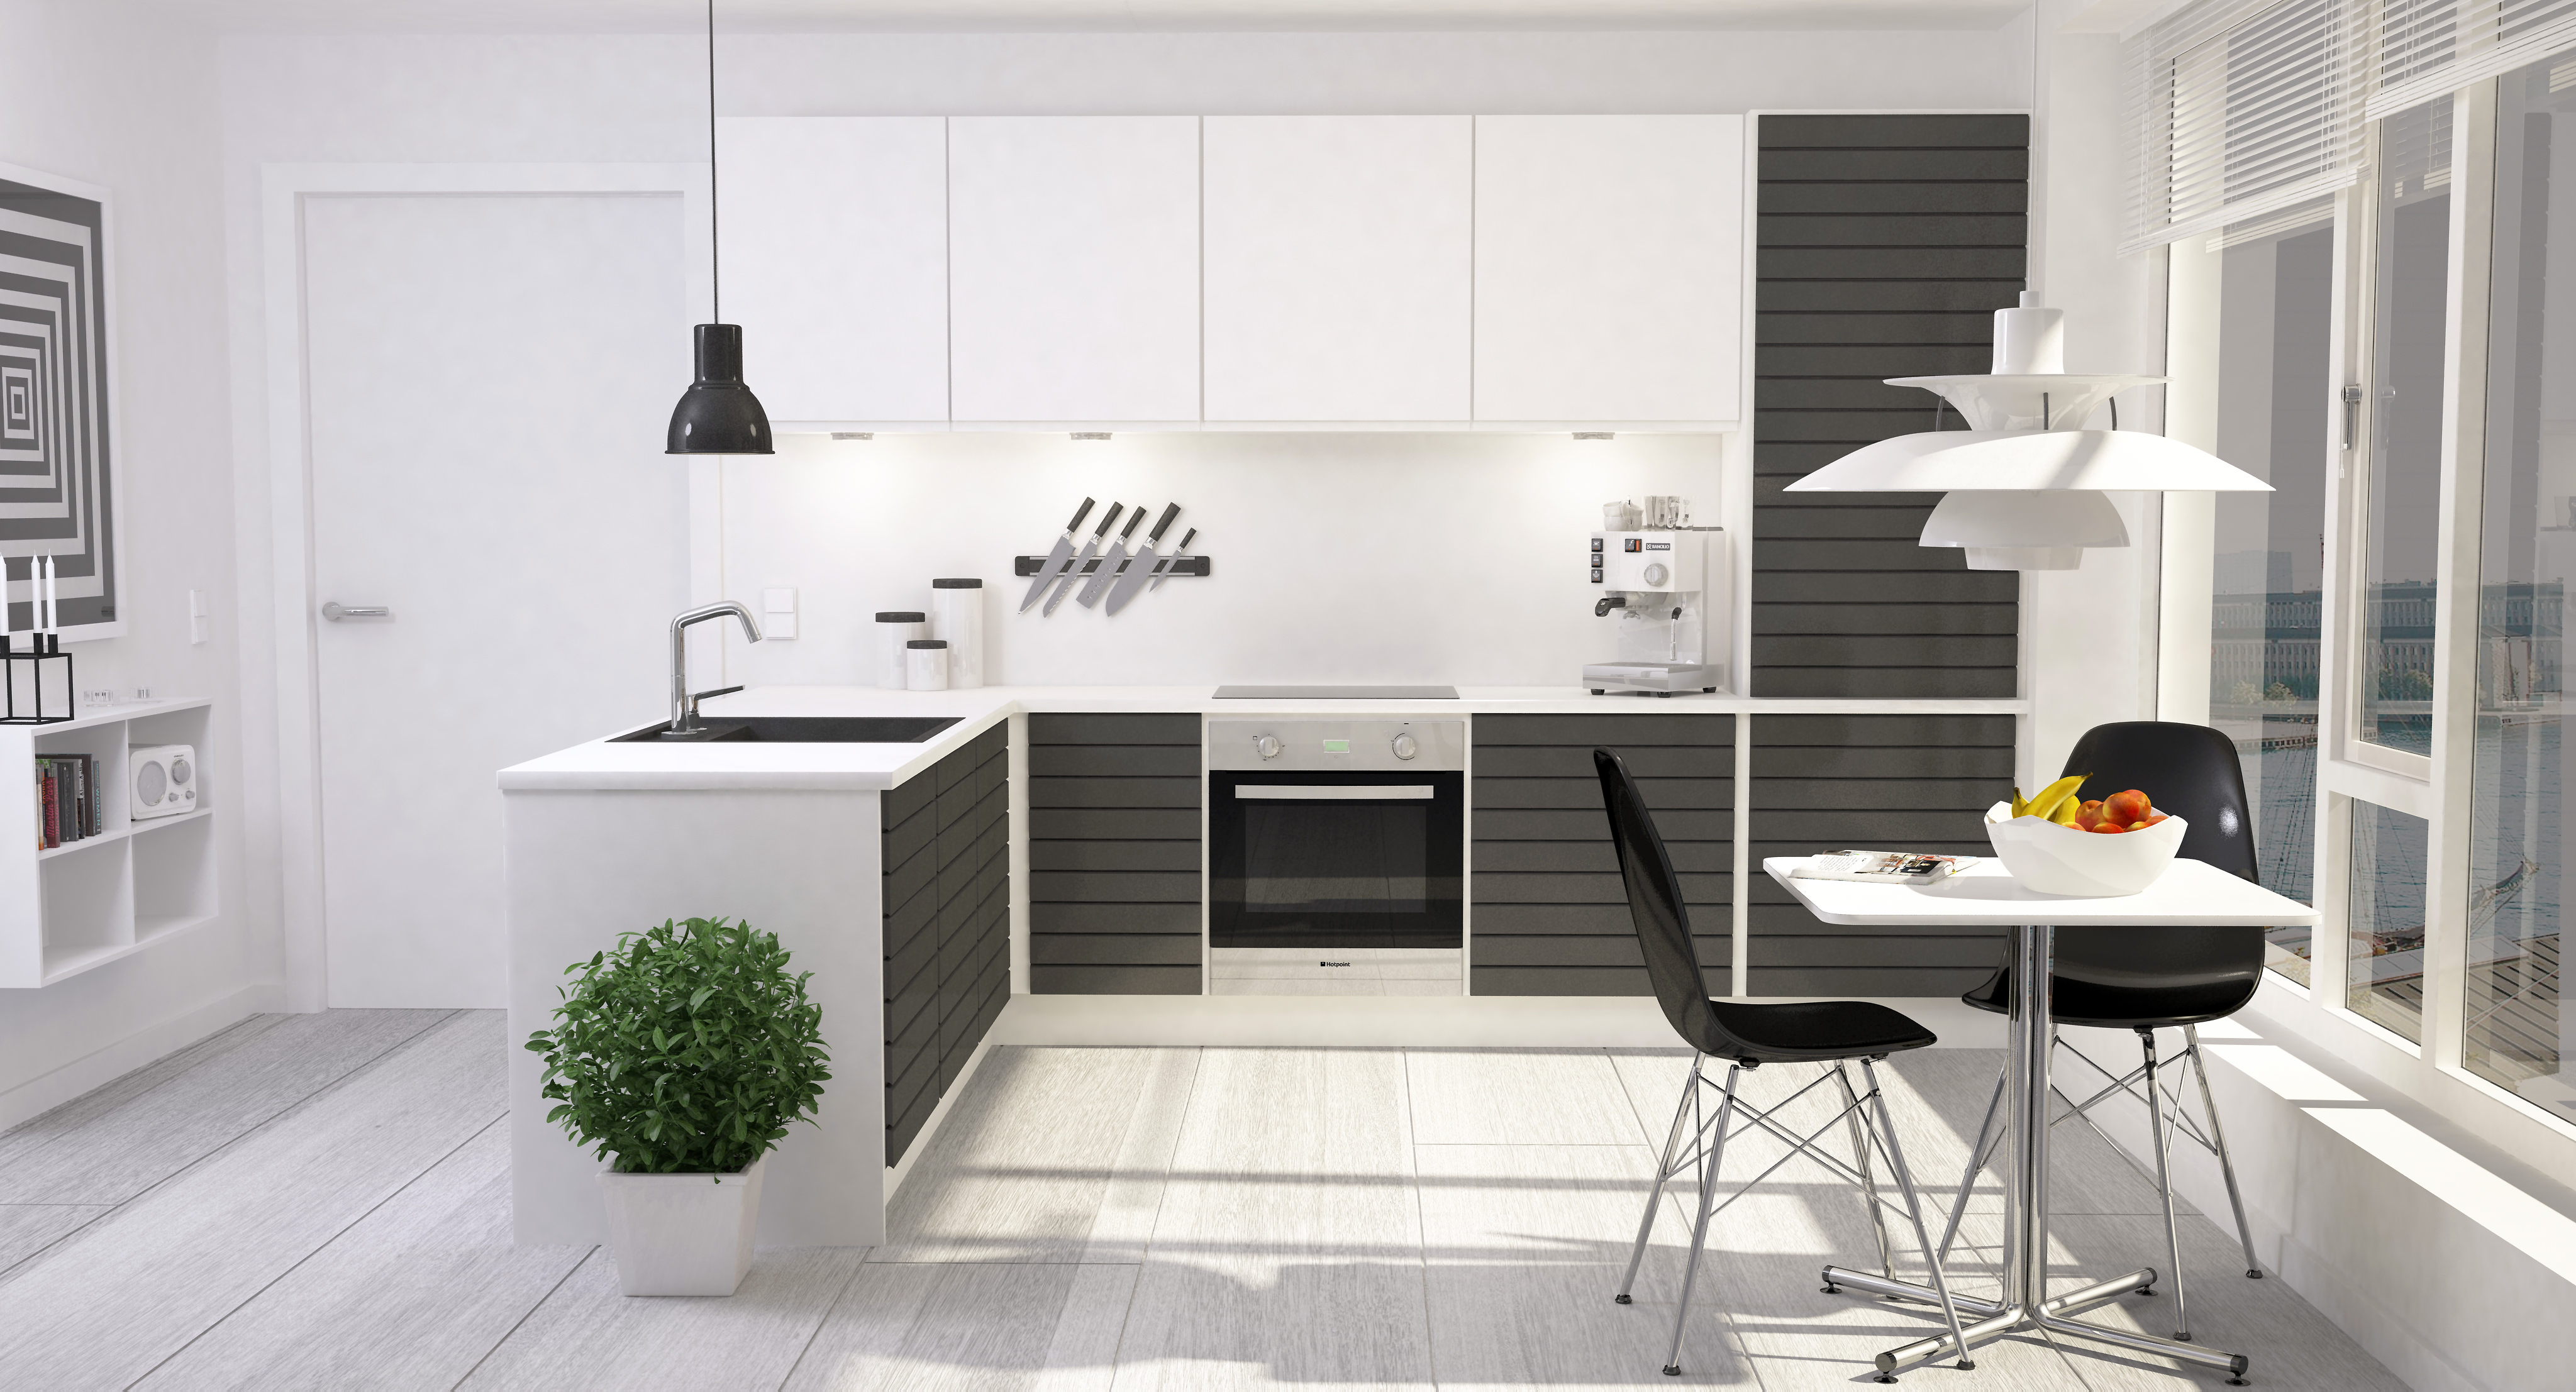 Kitchen 3d Model classic kitchen nordic style 3d model max obj